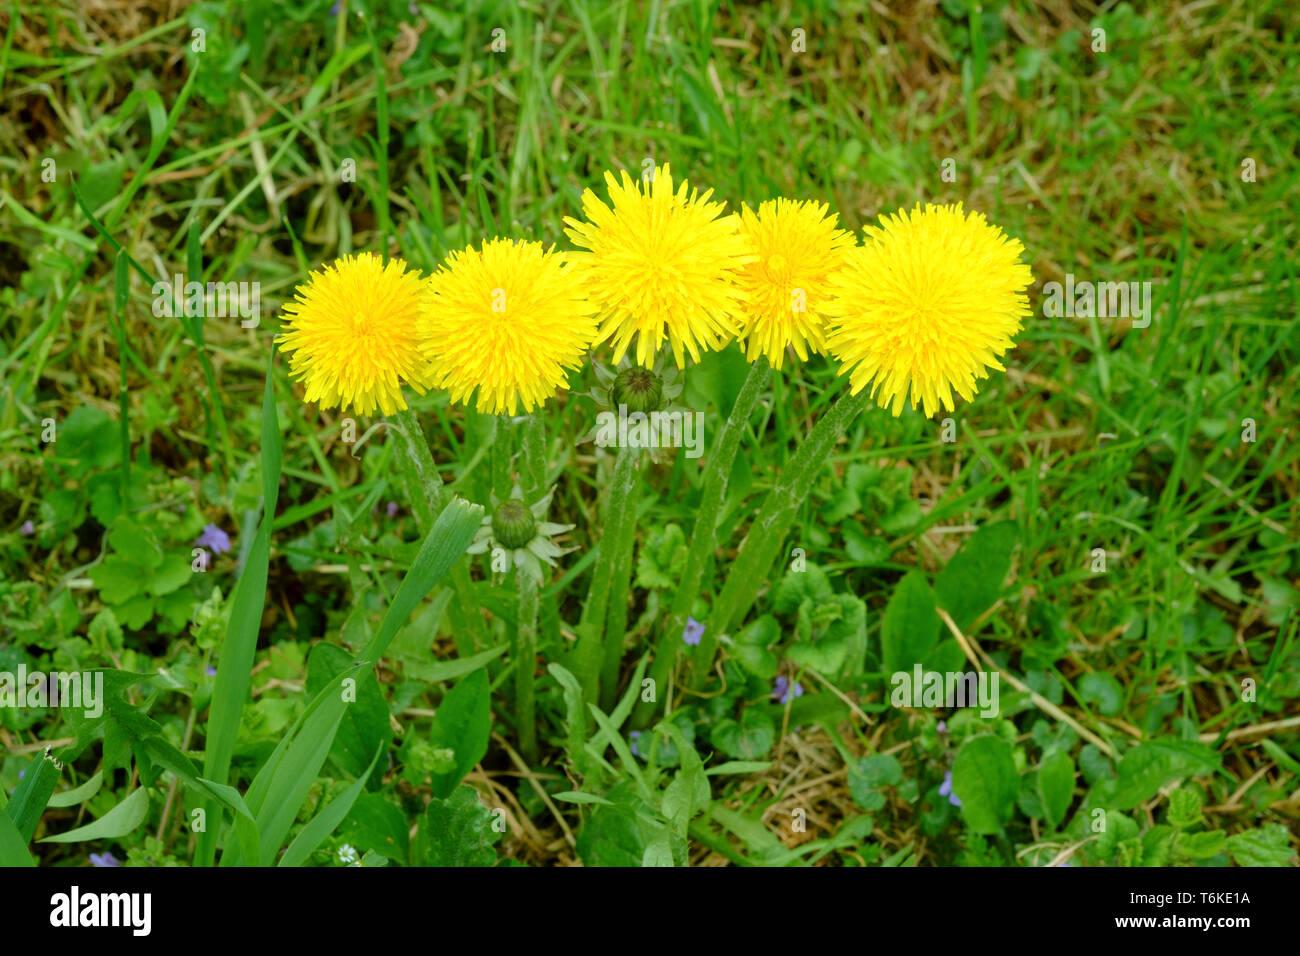 bright yellow dandelions taraxacum officinale growing in a rural garden zala county hungary Stock Photo